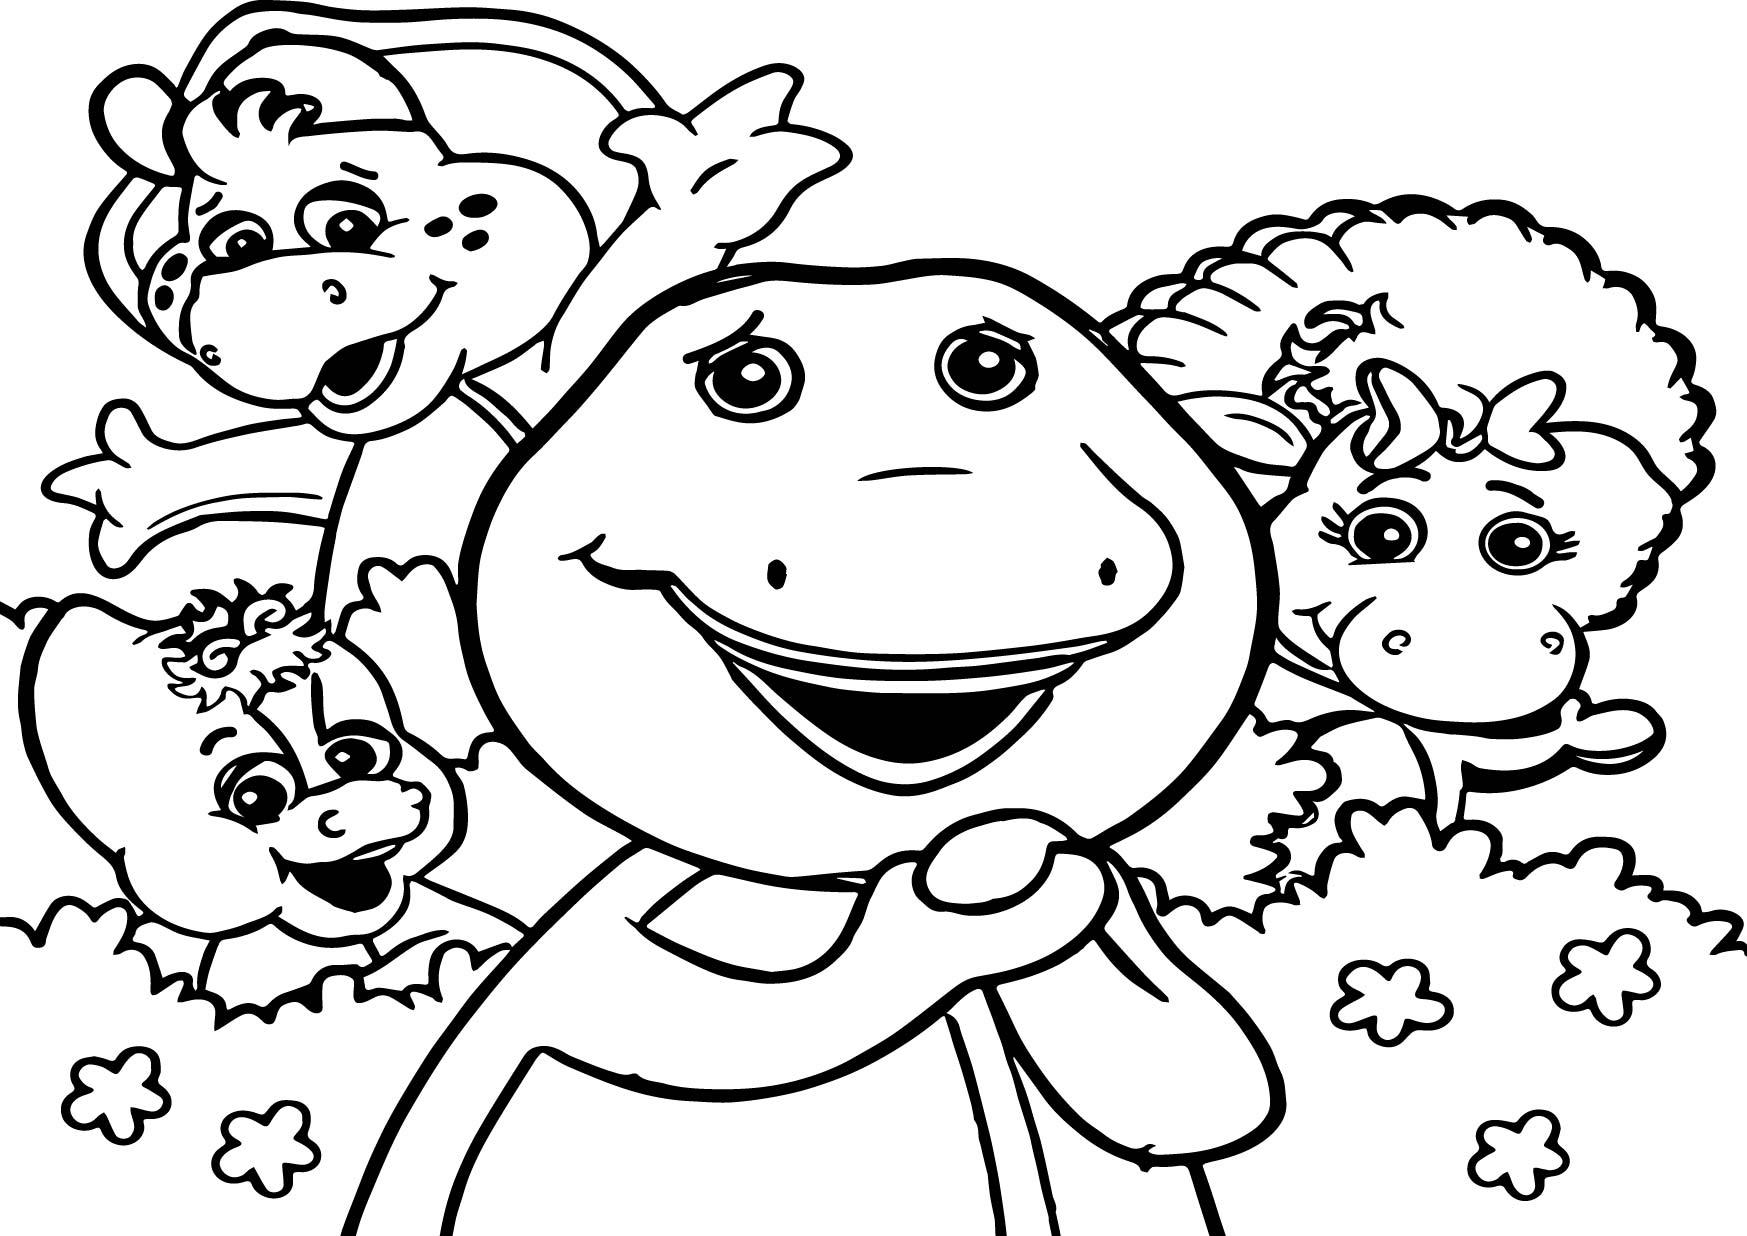 1747x1236 Barney Cartoon Pencil Drawing Barney The Dinosaur Coloring